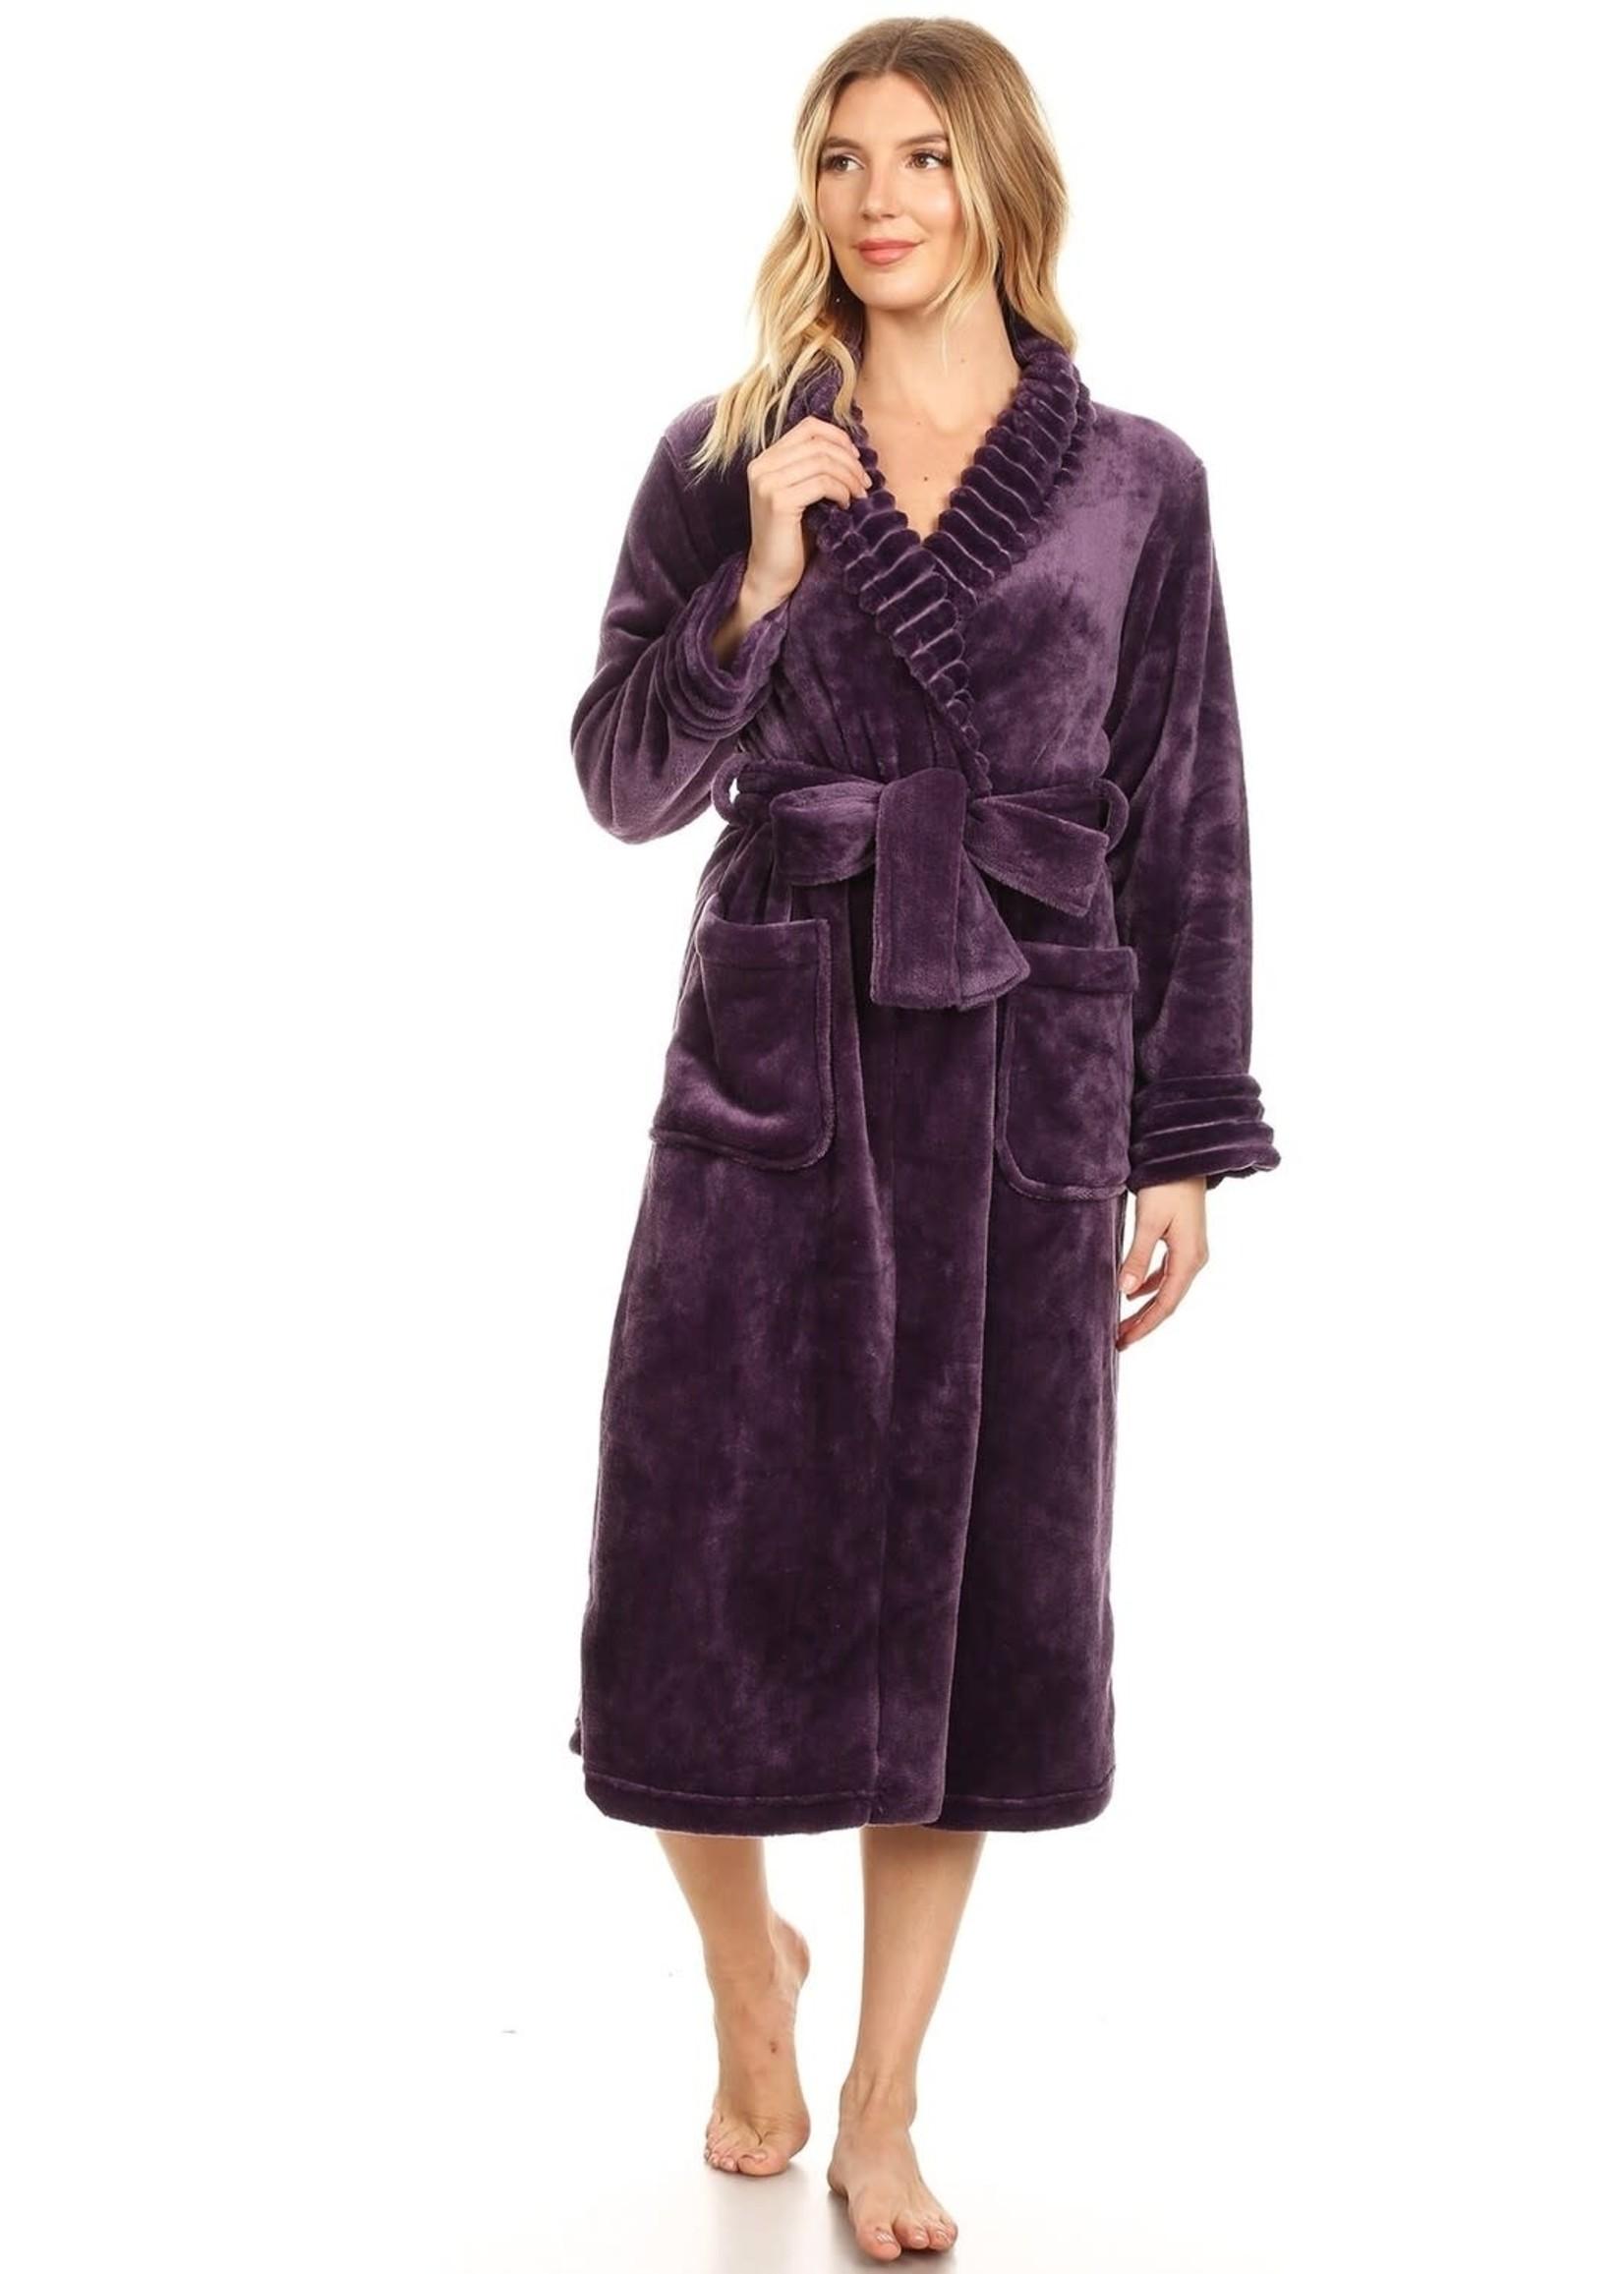 Purple Super Soft Lounge Robe